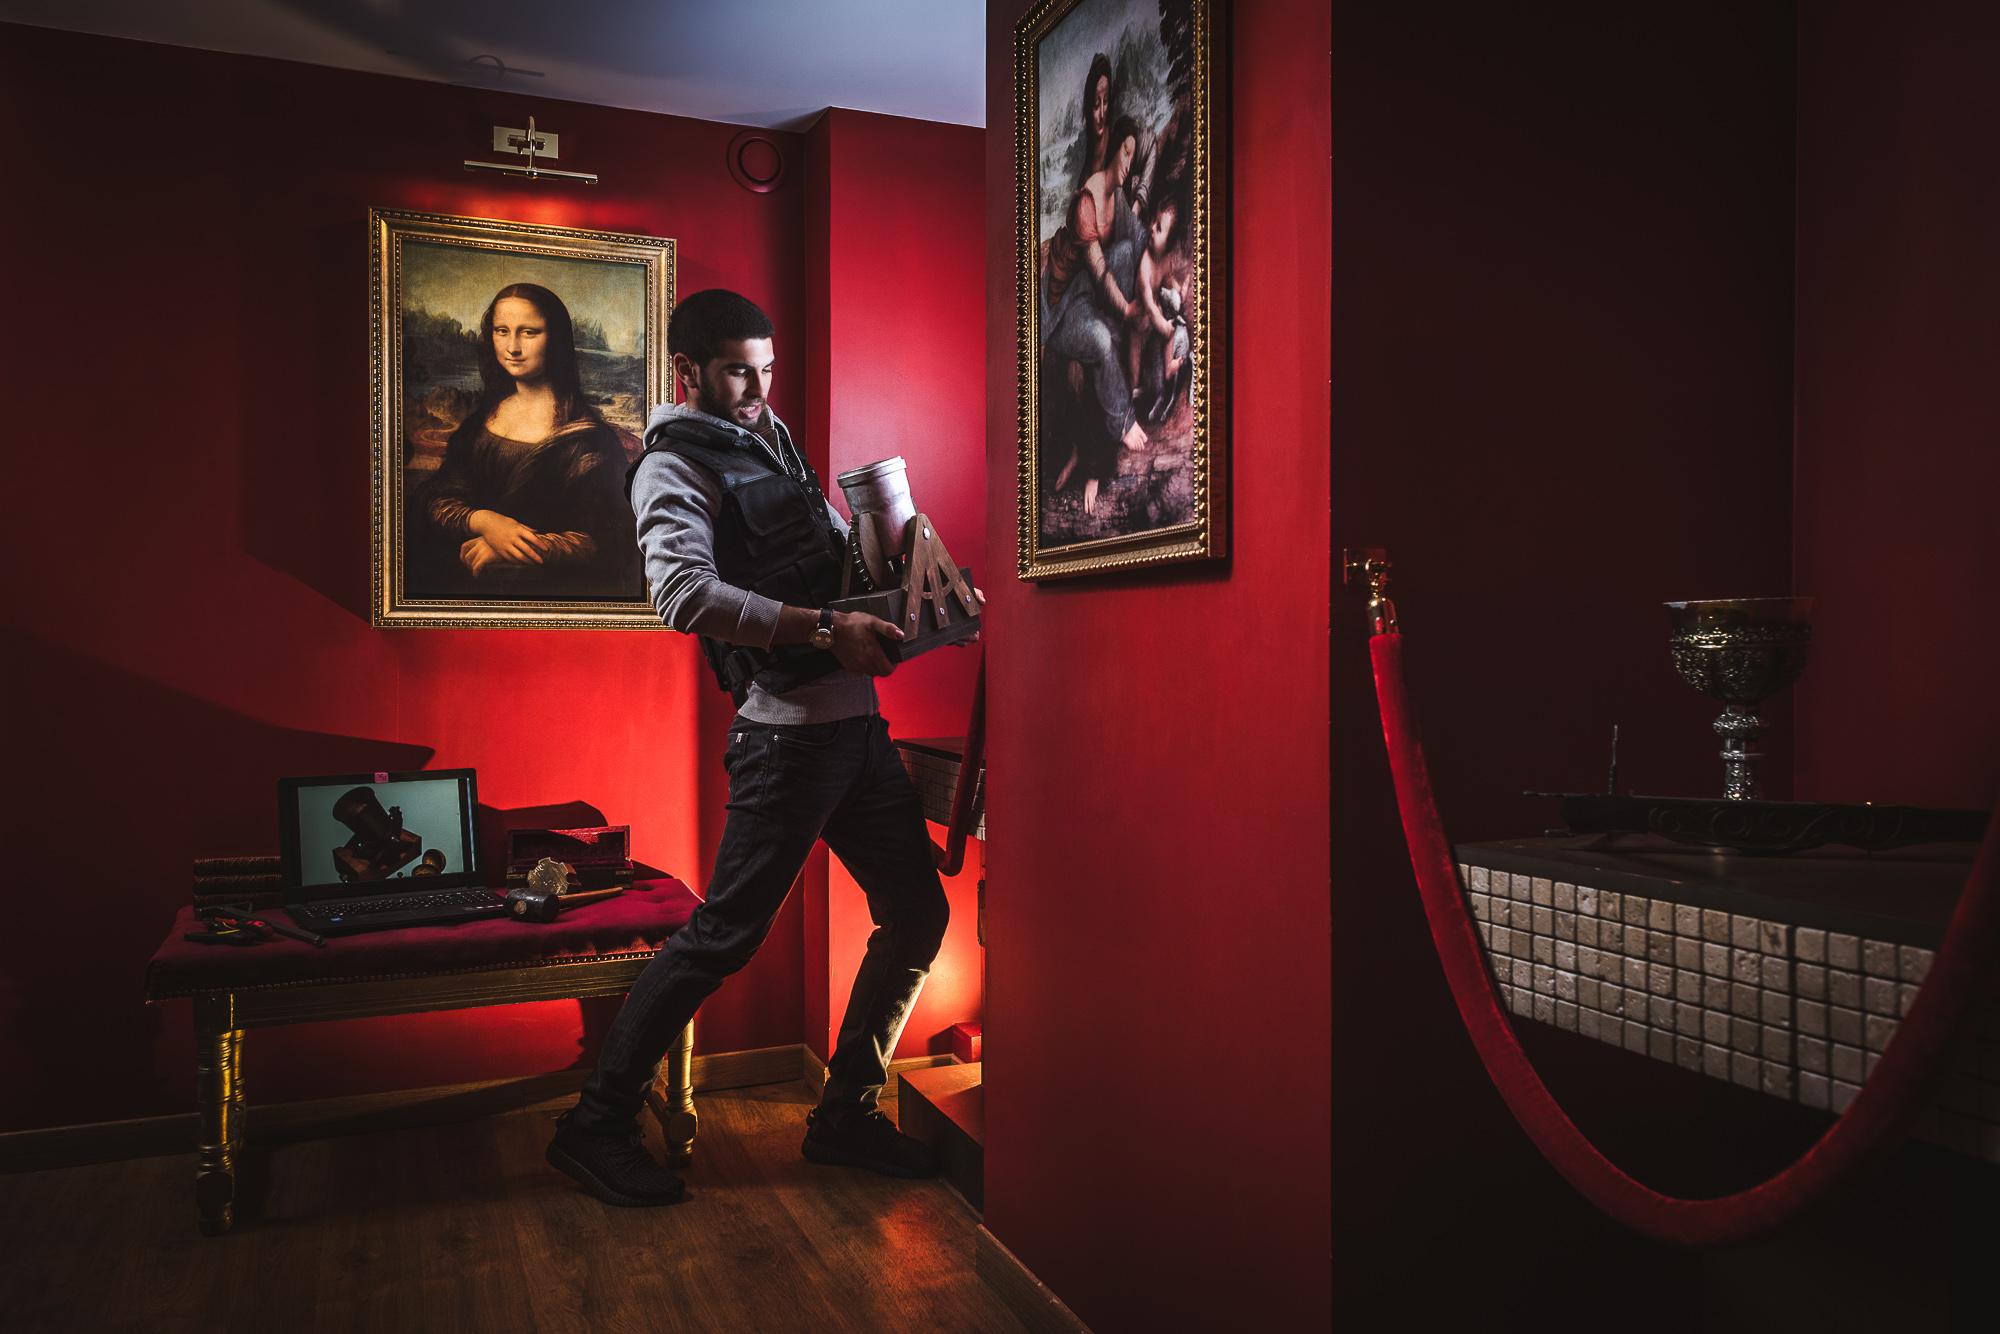 The Room Da Vinci Game